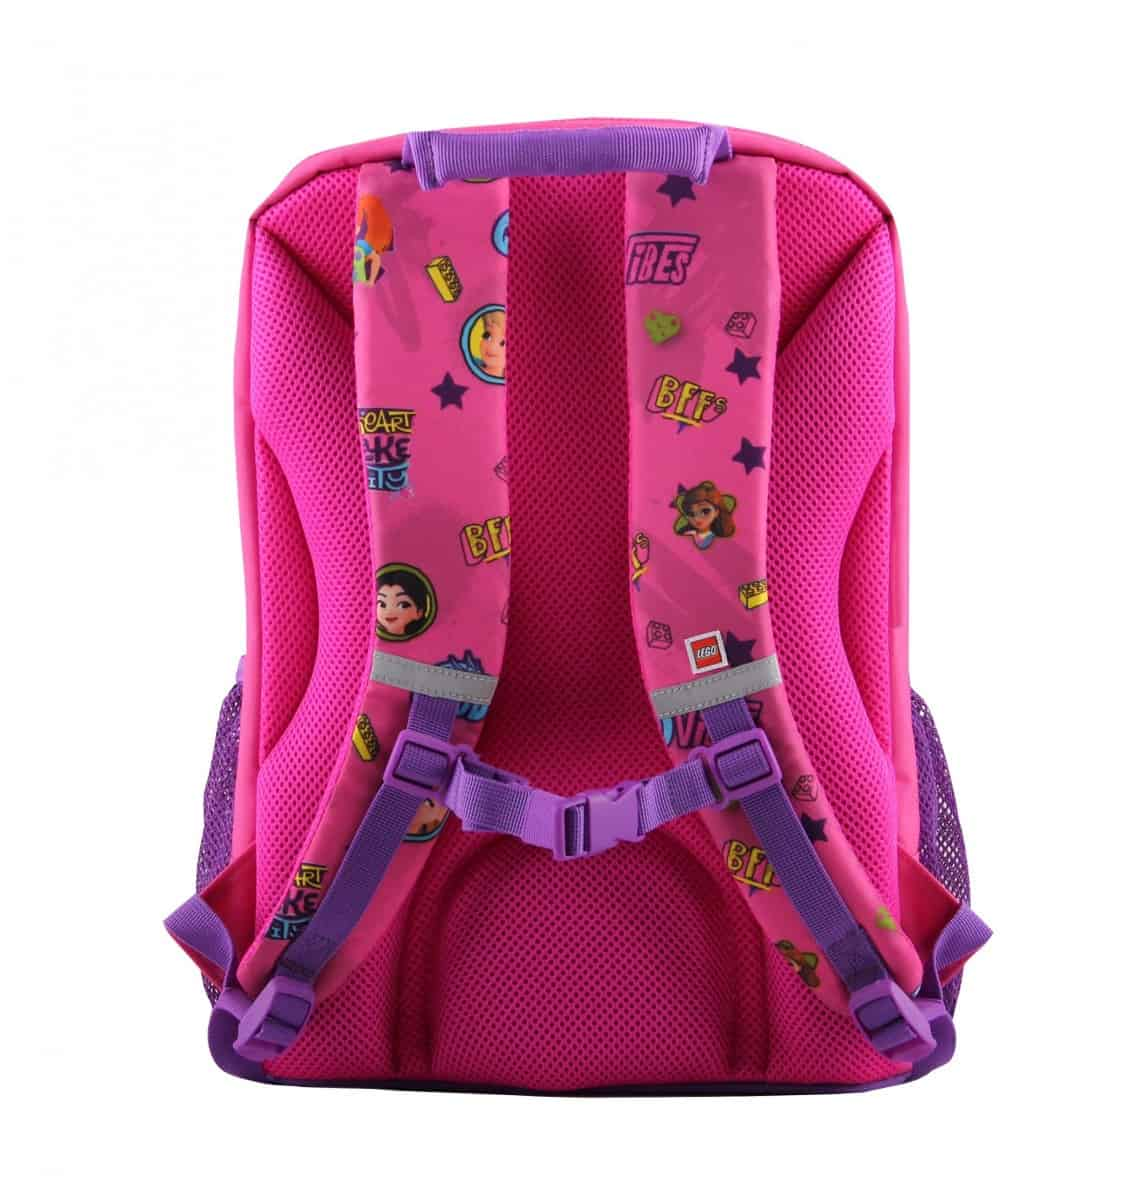 lego 5005919 friends belight backpack scaled